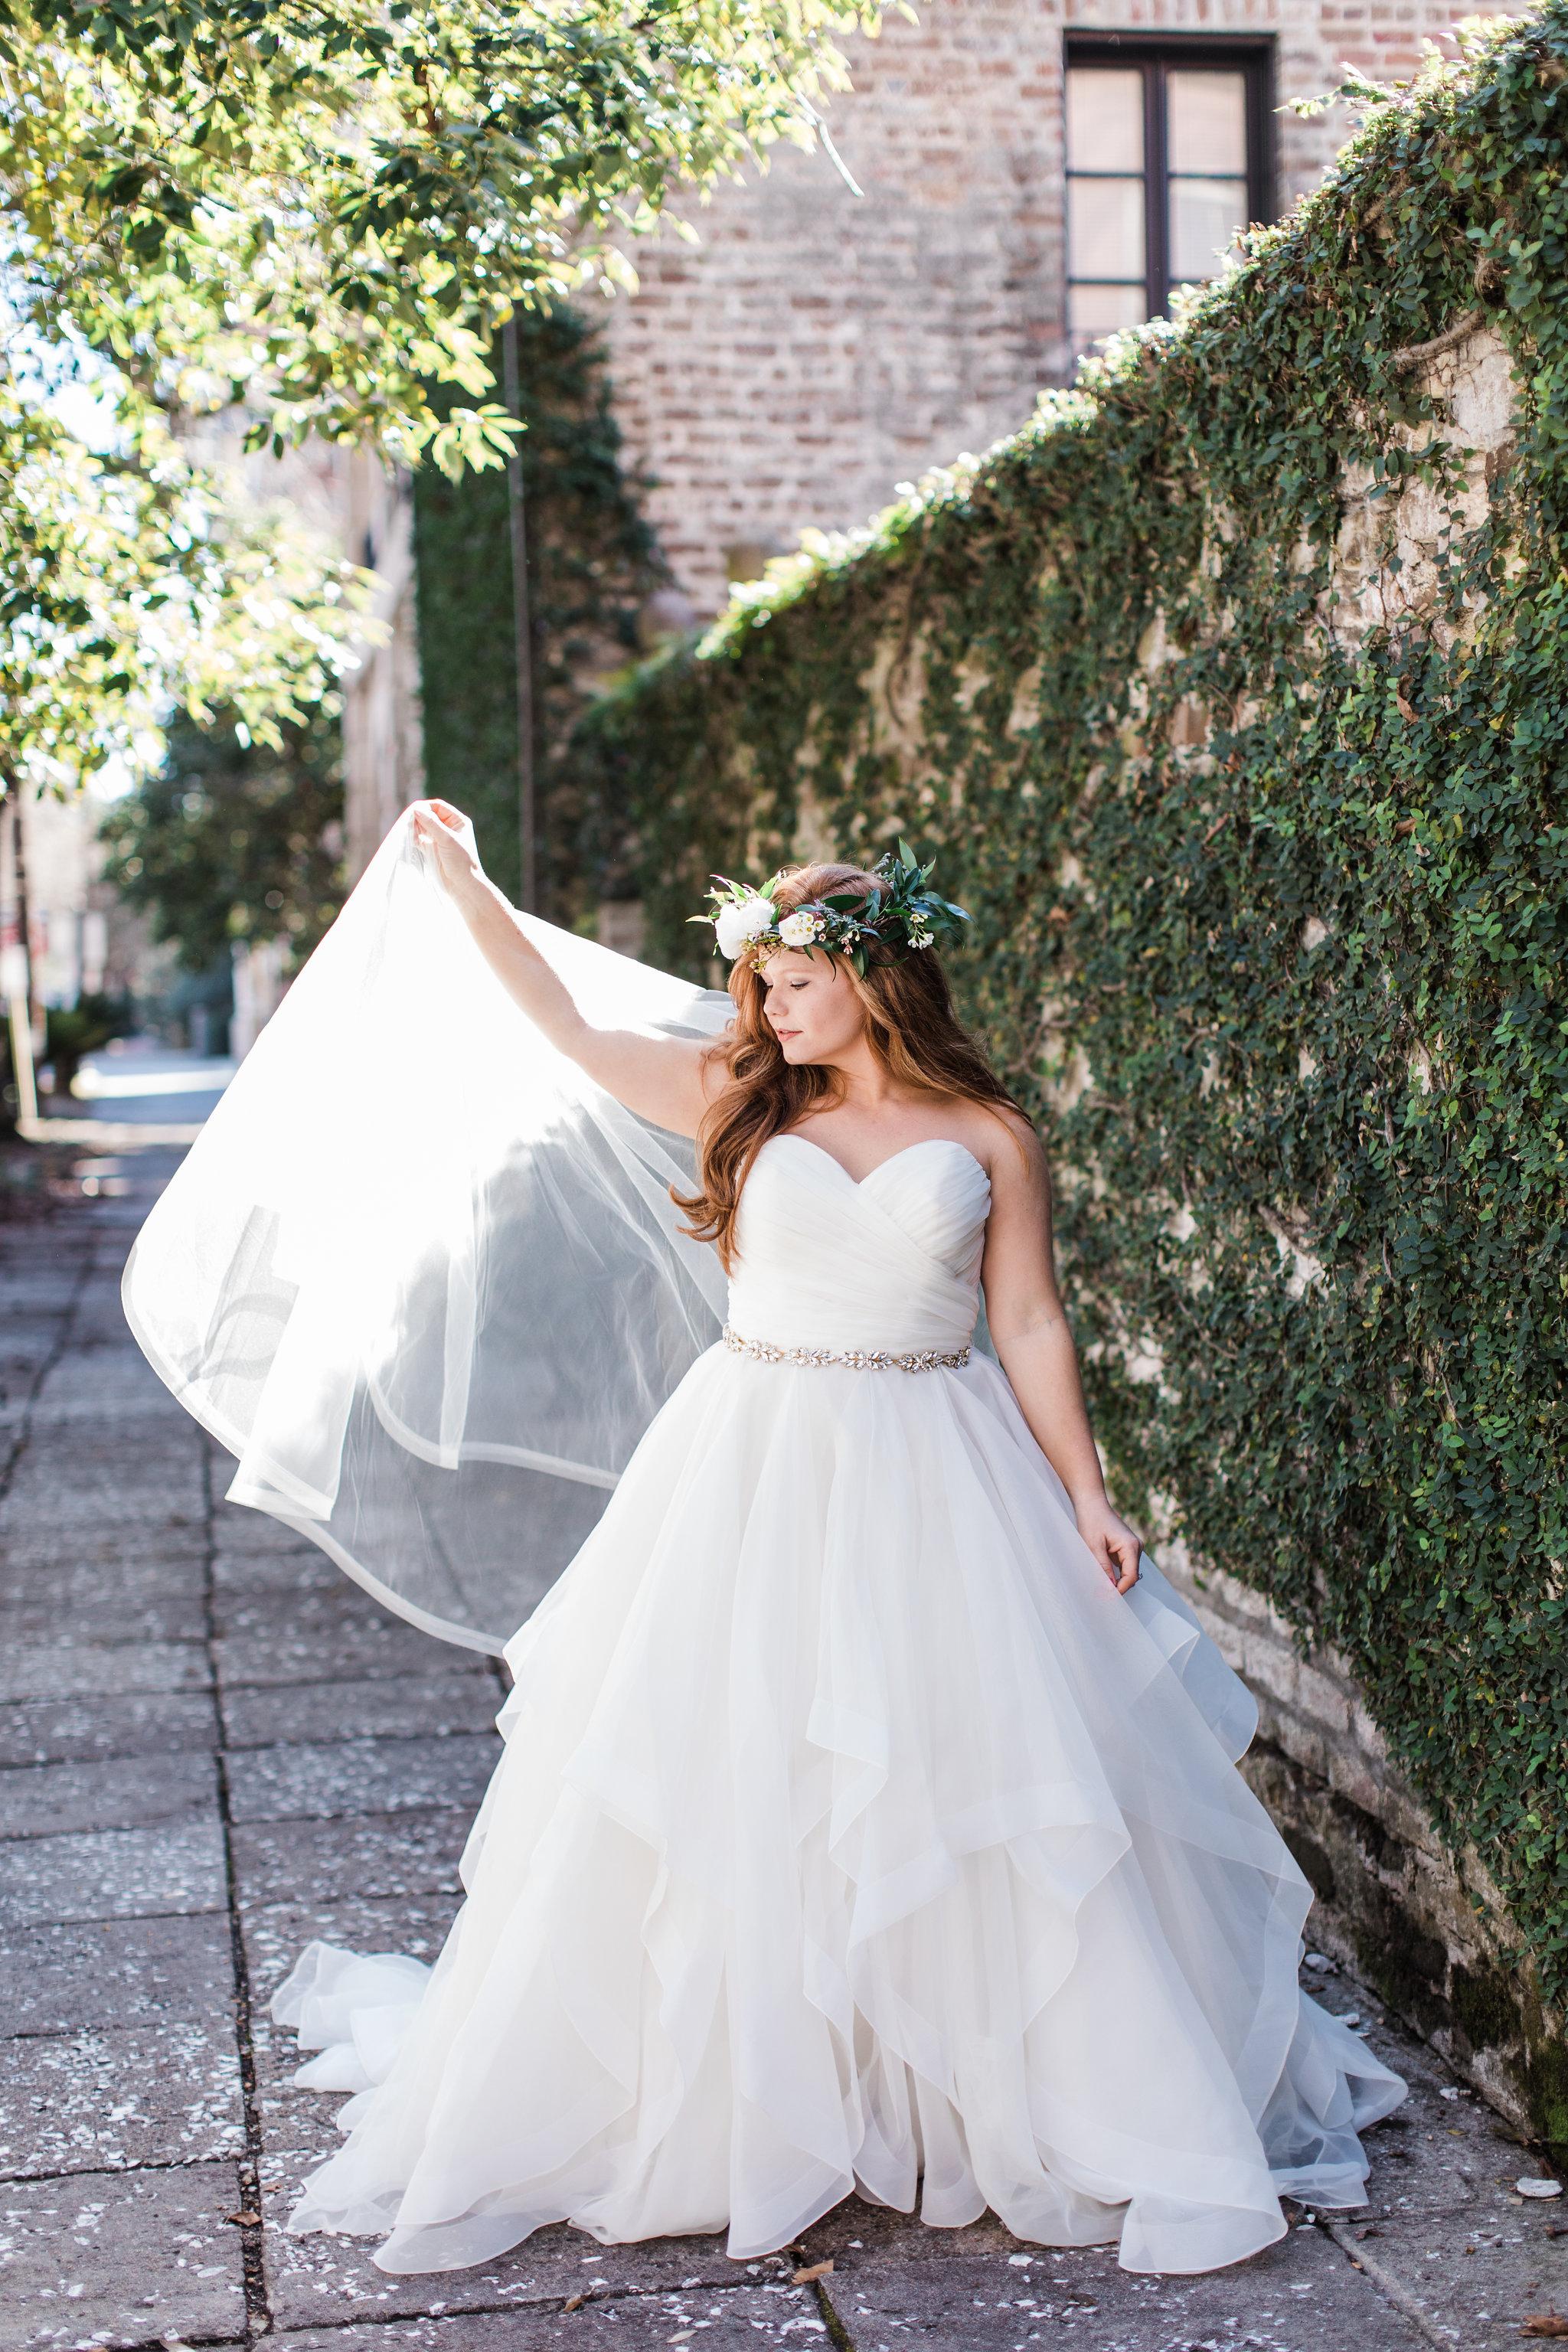 apt-b-photography-mary-elizabeths-bridal-boutique-adele-amelia-accessories-morilee-5504-savannah-bridal-boutique-savannah-weddings-savannah-wedding-photographer-savannah-bridal-gowns-savannah-wedding-dresses-historic-savannah-wedding-3.jpg